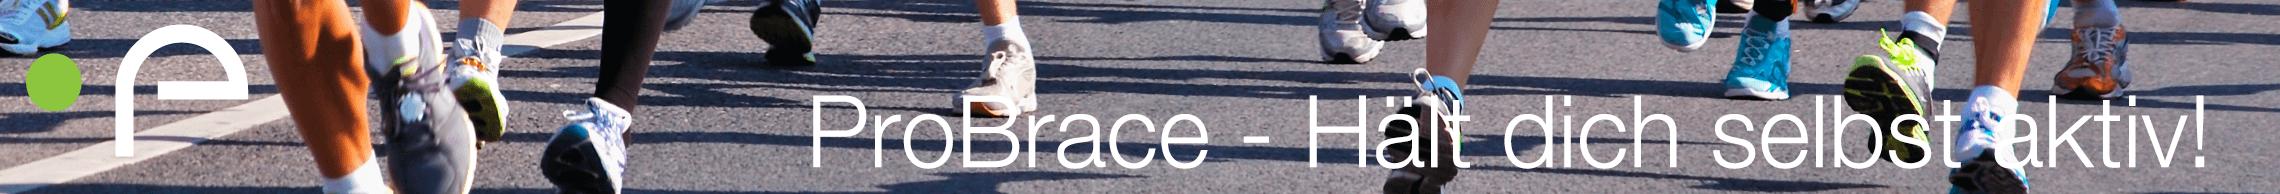 Bandagen & Orthese online kaufen bei ProBrace.de